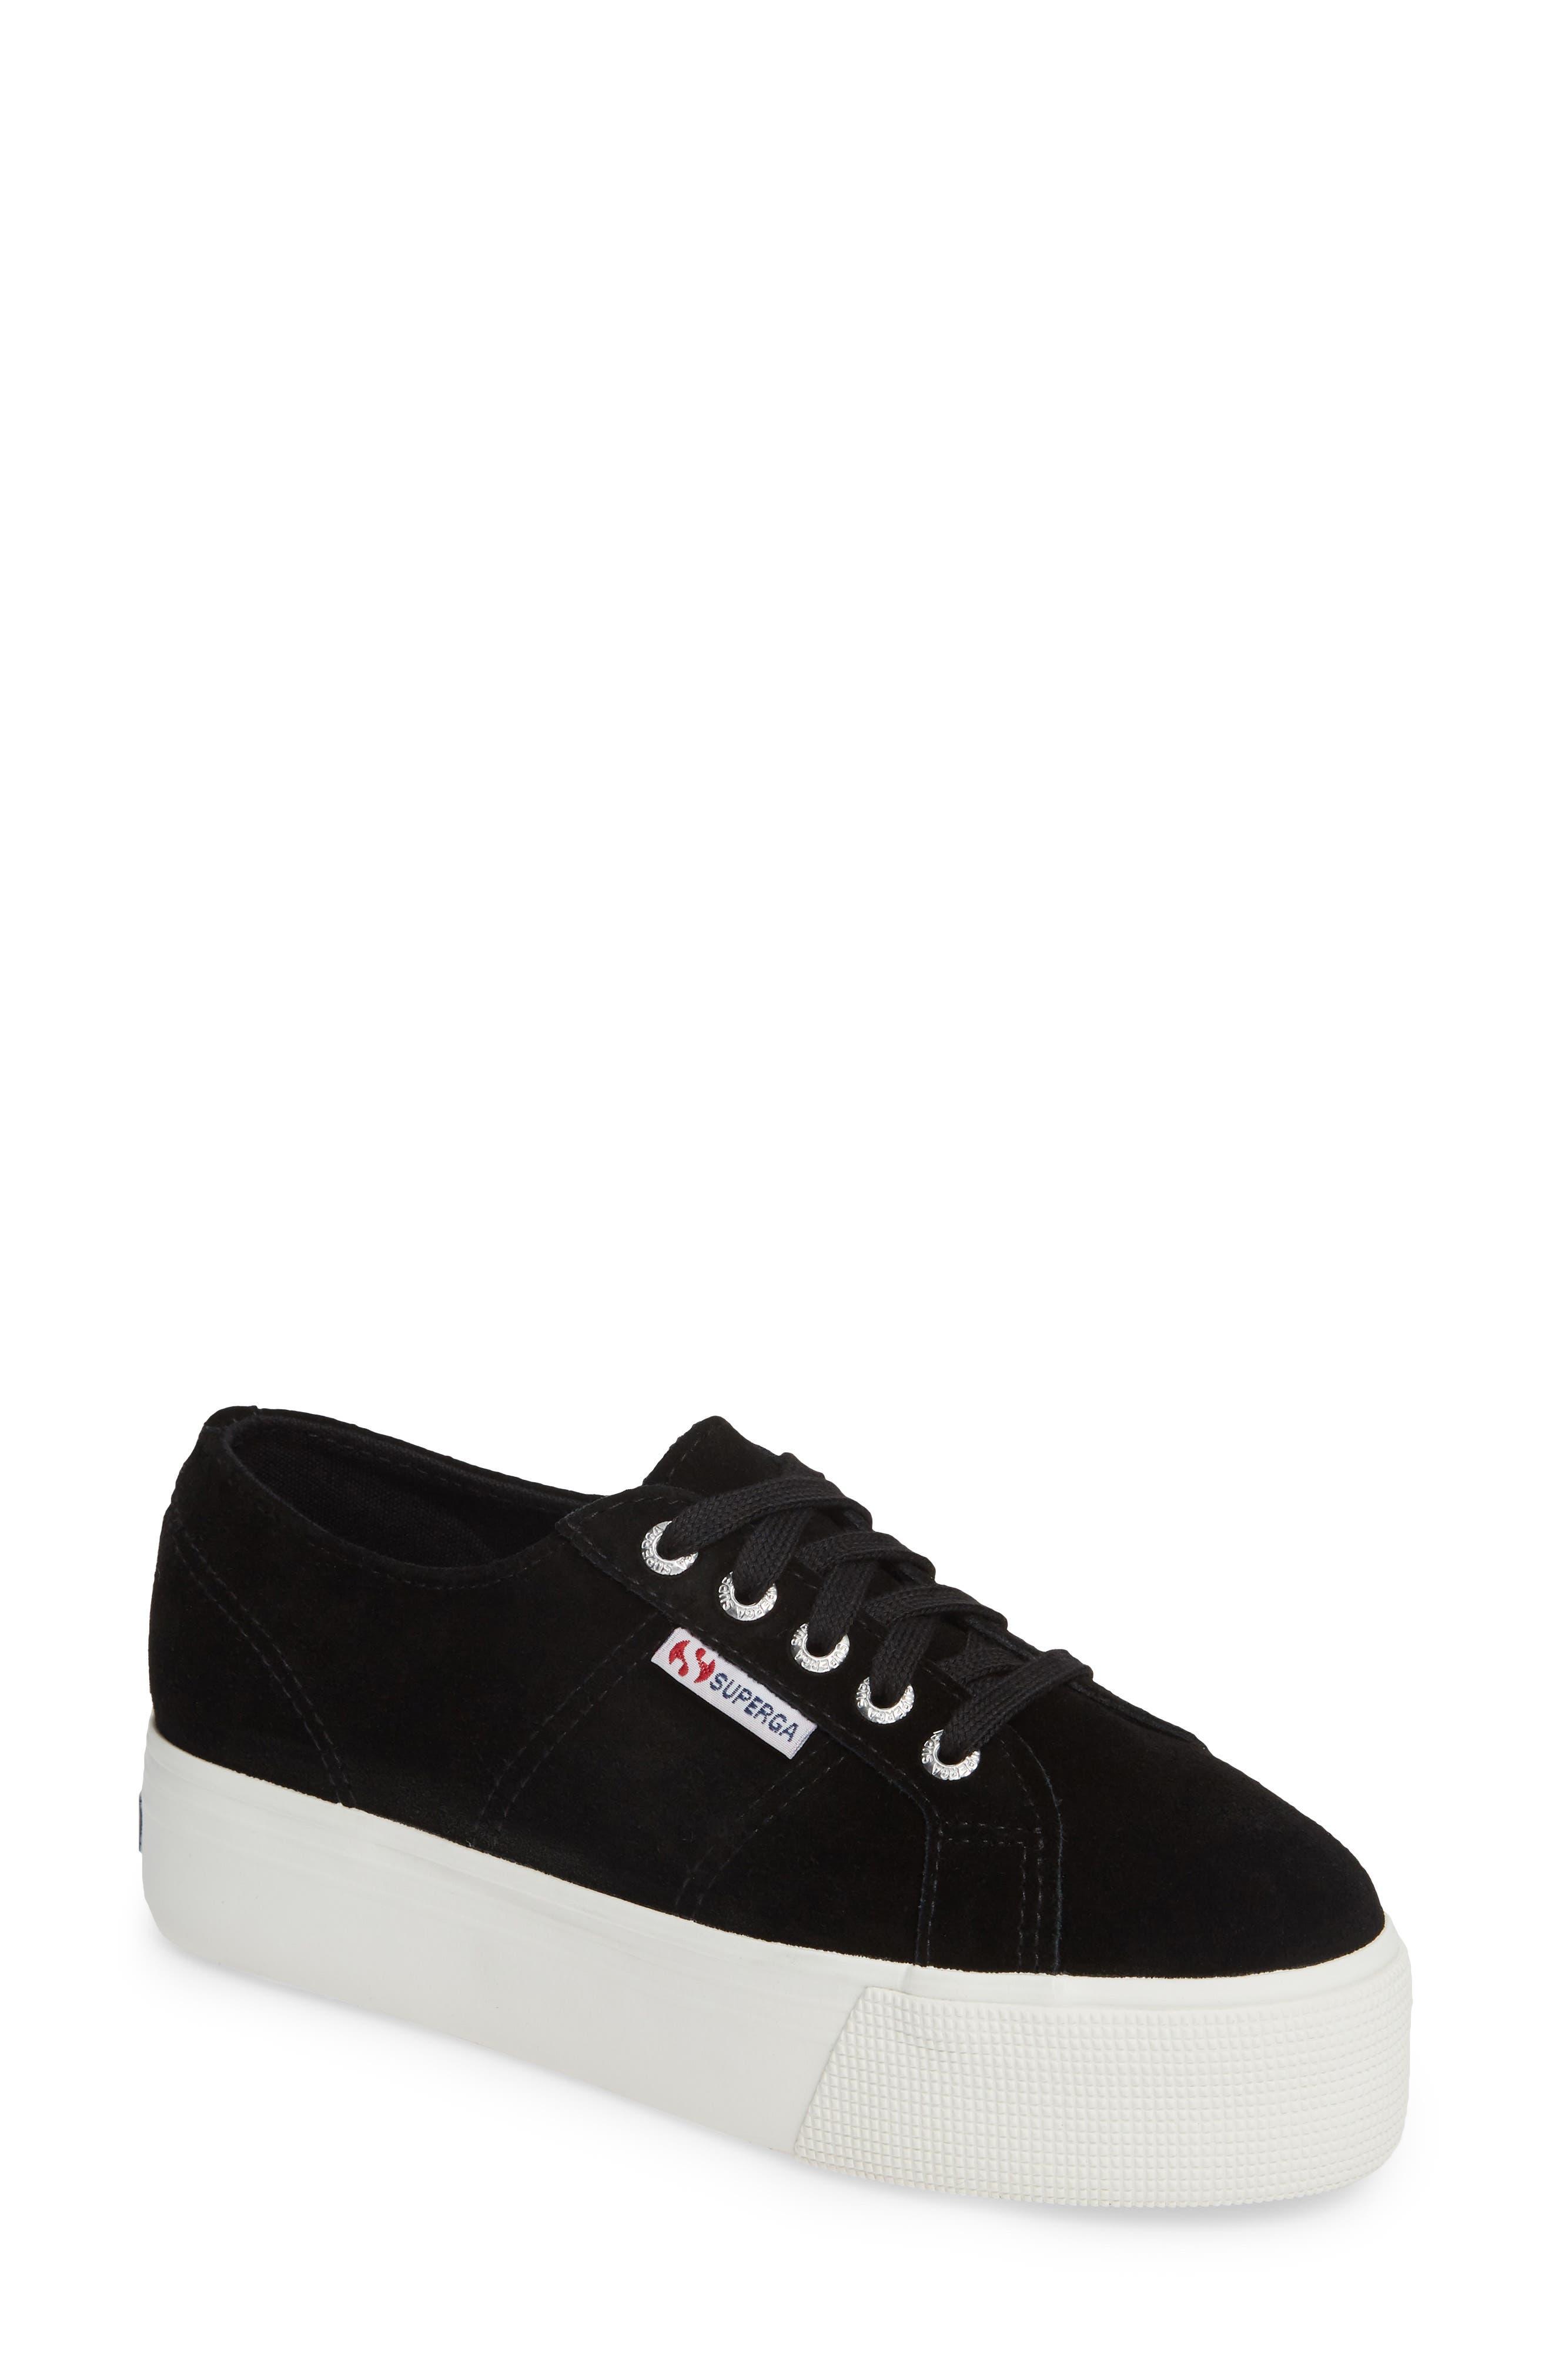 2790 Platform Sneaker,                         Main,                         color, 006